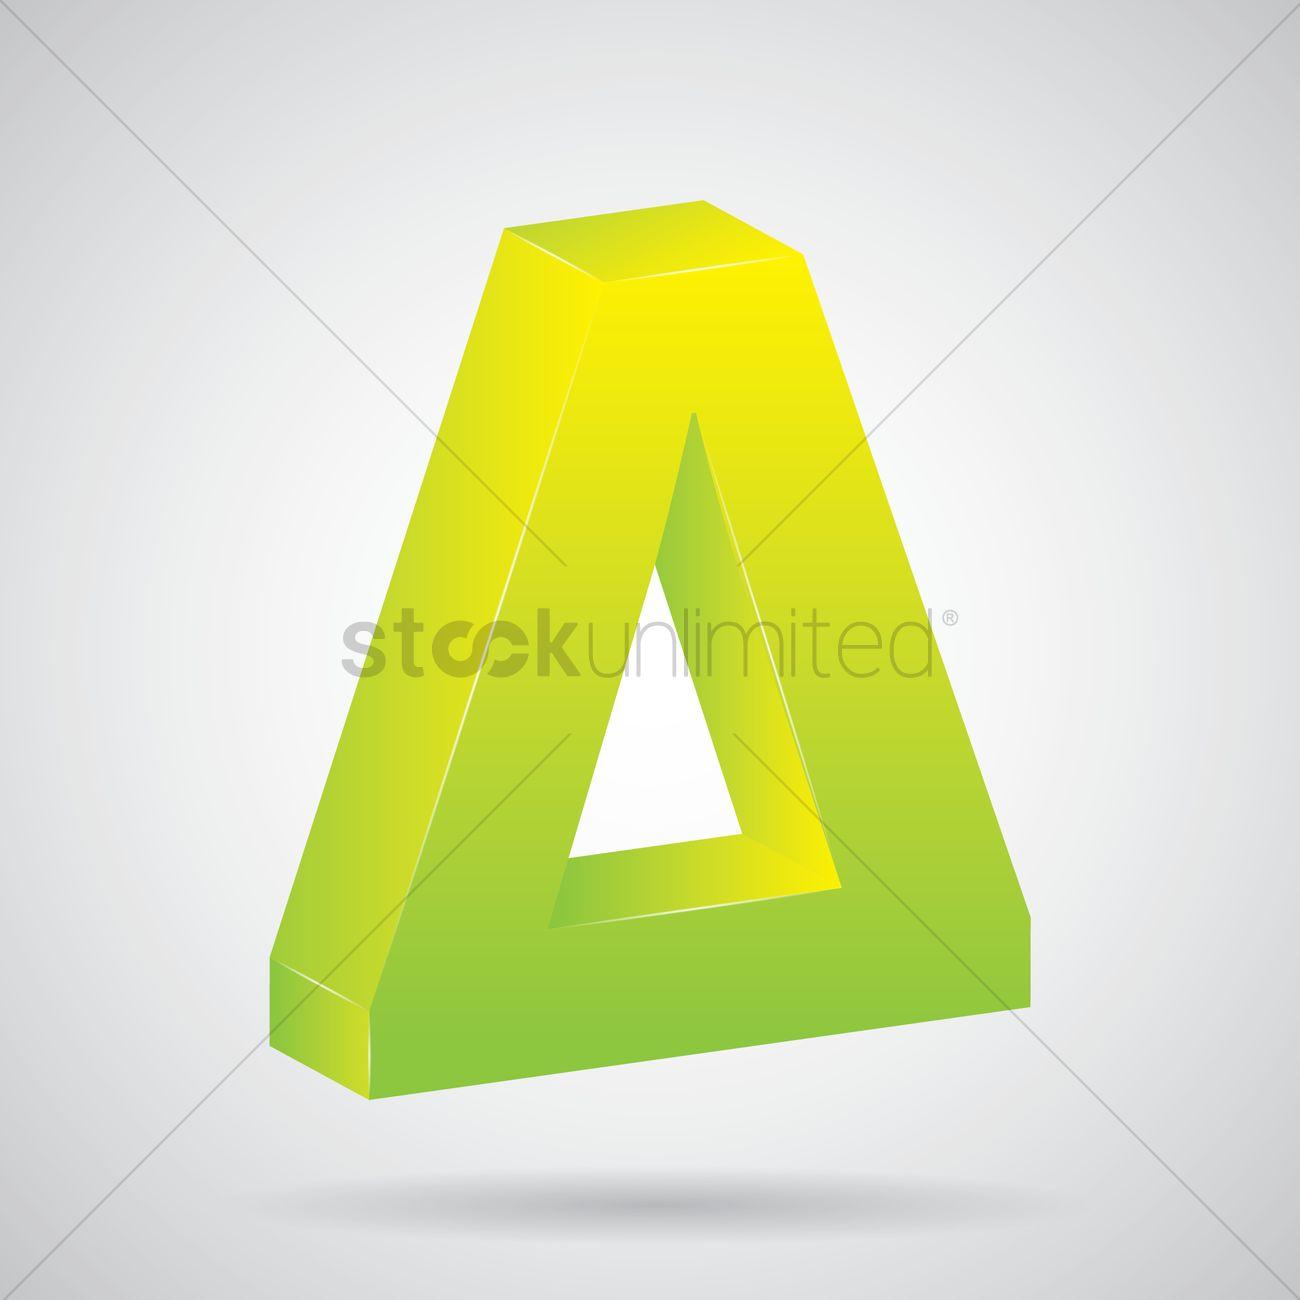 Delta sign vector image 1608943 stockunlimited delta sign vector graphic buycottarizona